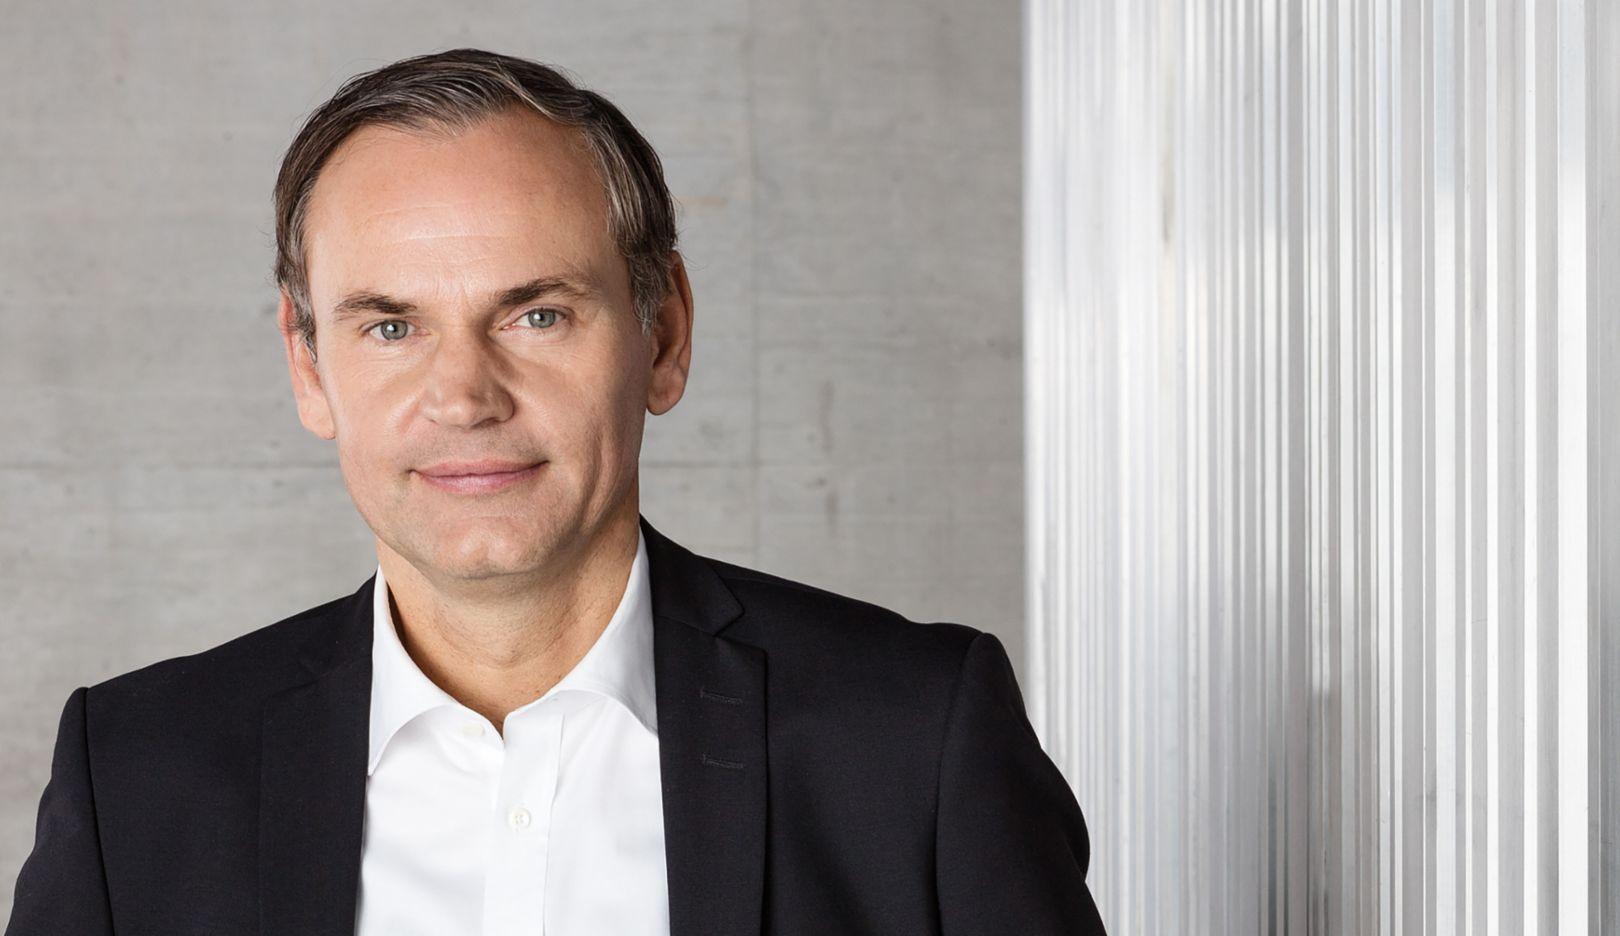 Oliver Blume, CEO, 2017, Porsche AG